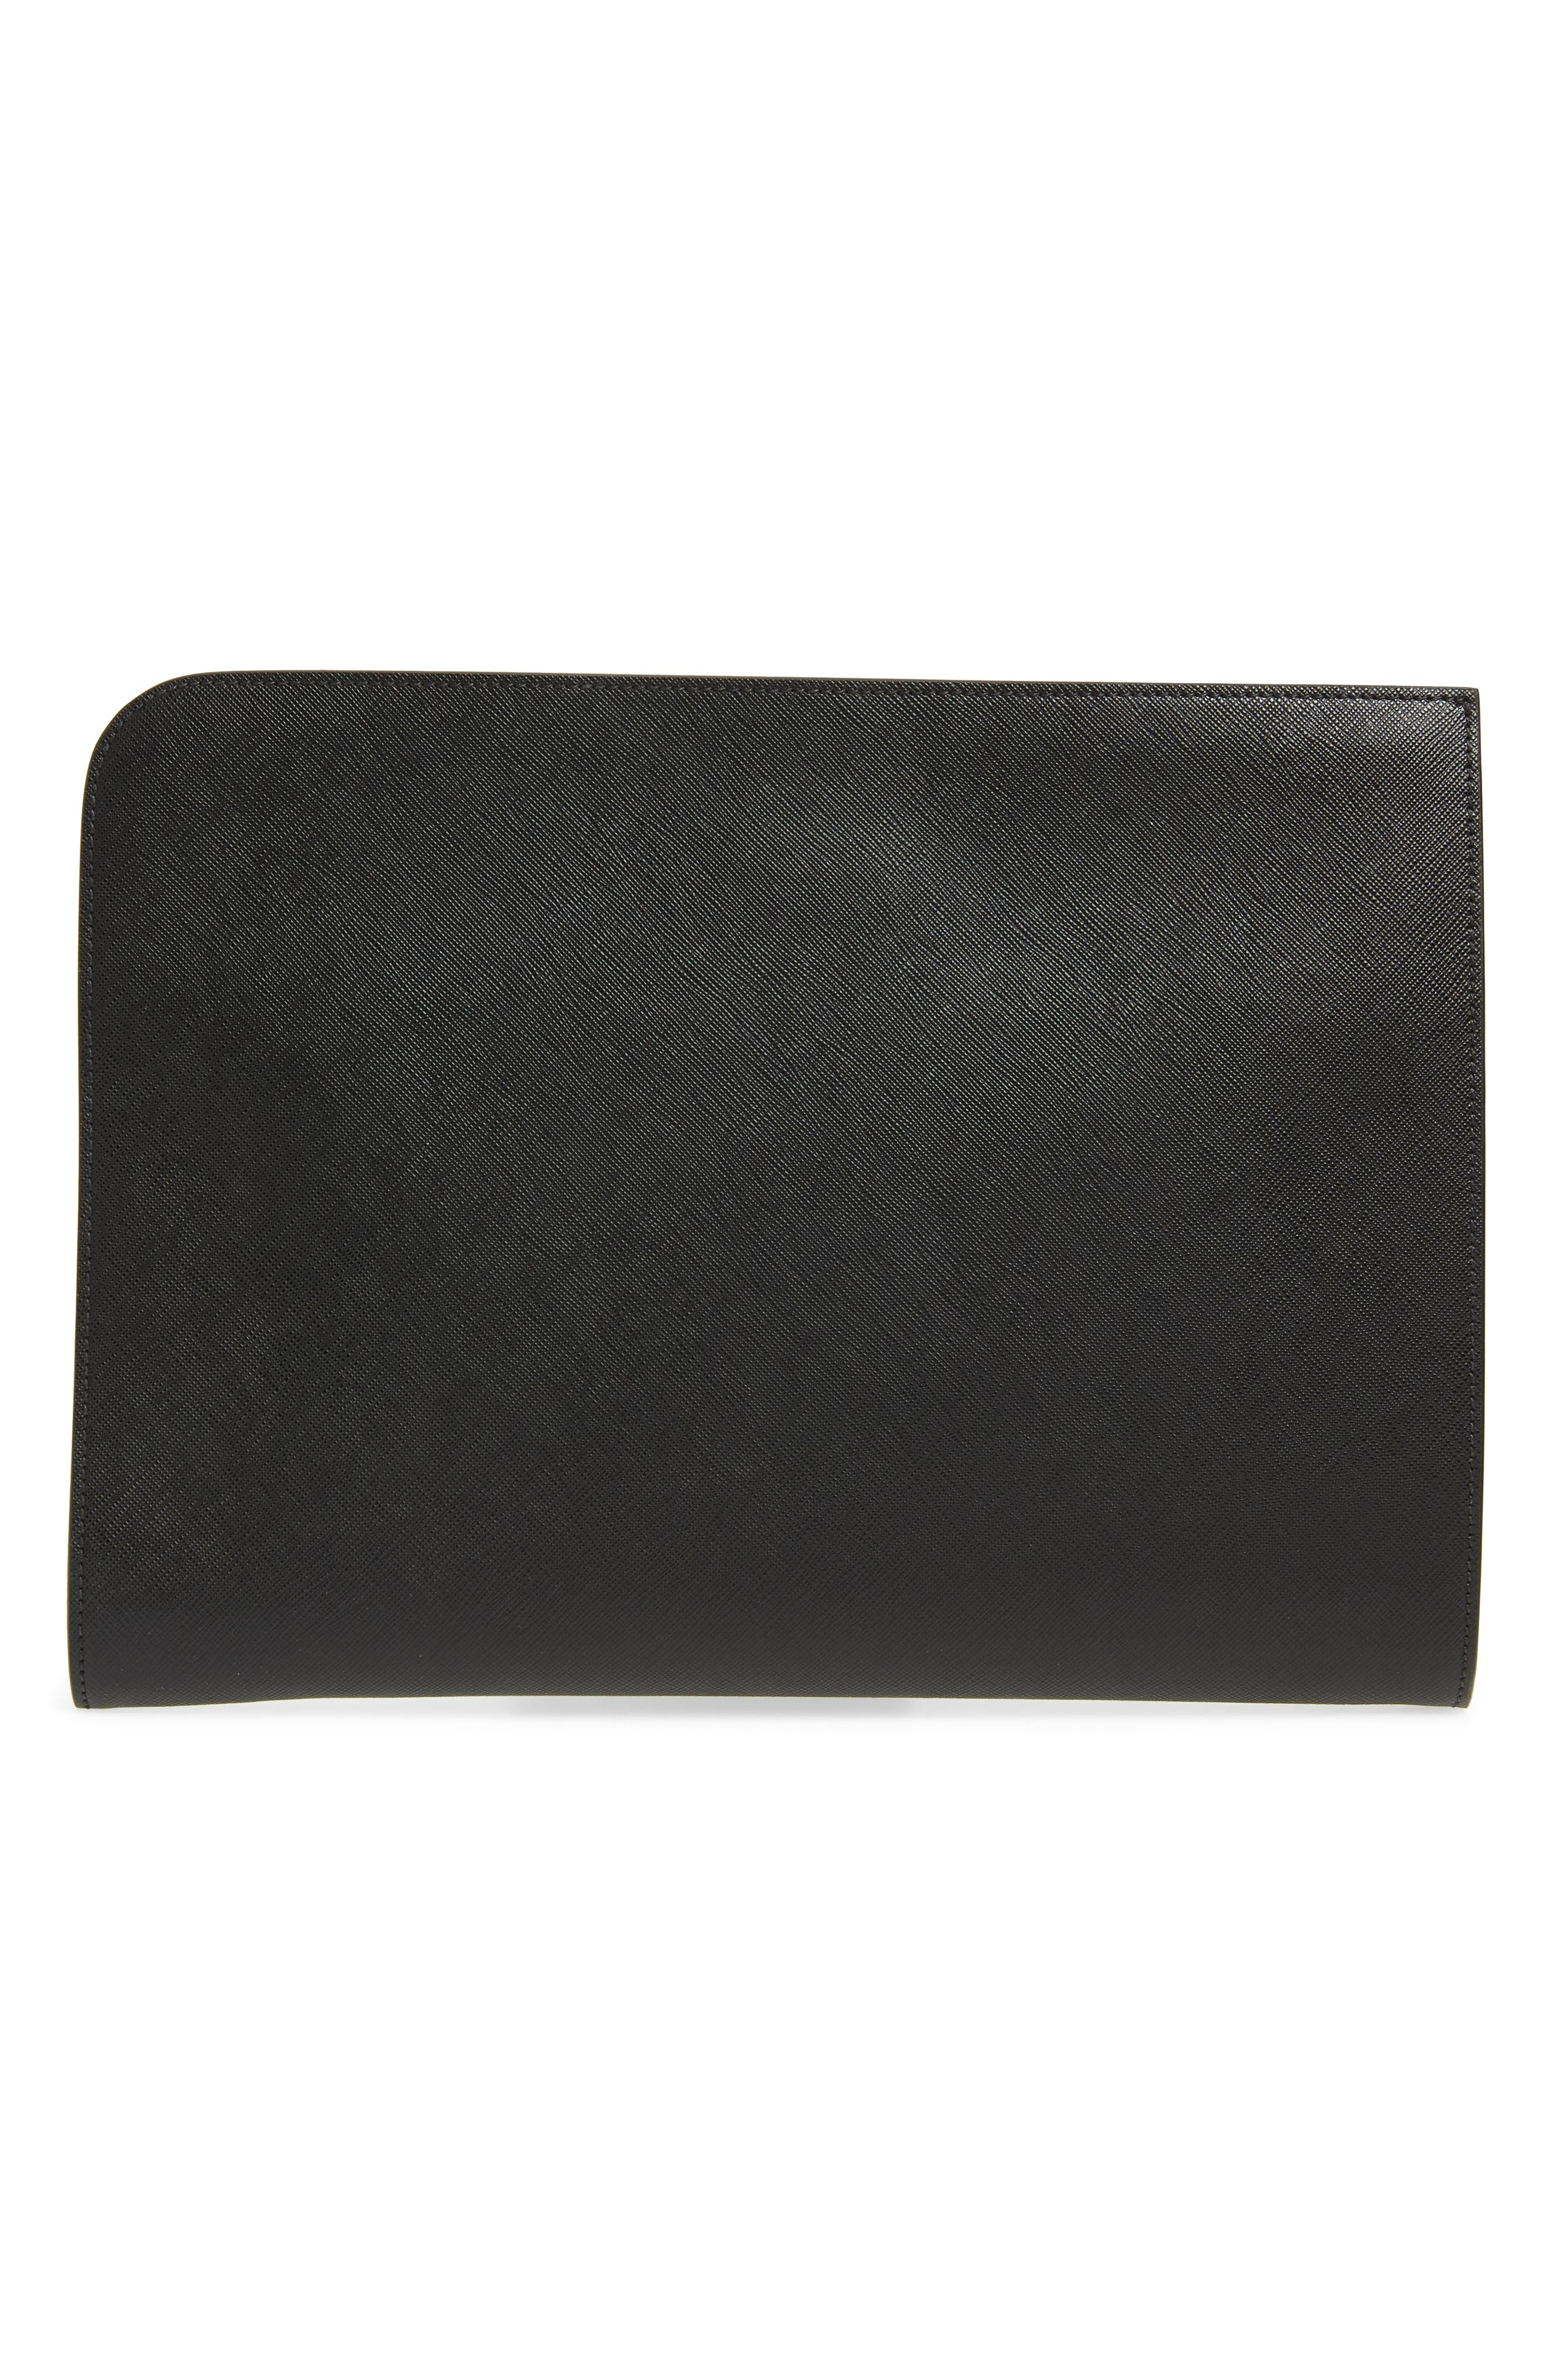 Saffiano Leather Zip Folio,                             Alternate thumbnail 2, color,                             BLACK